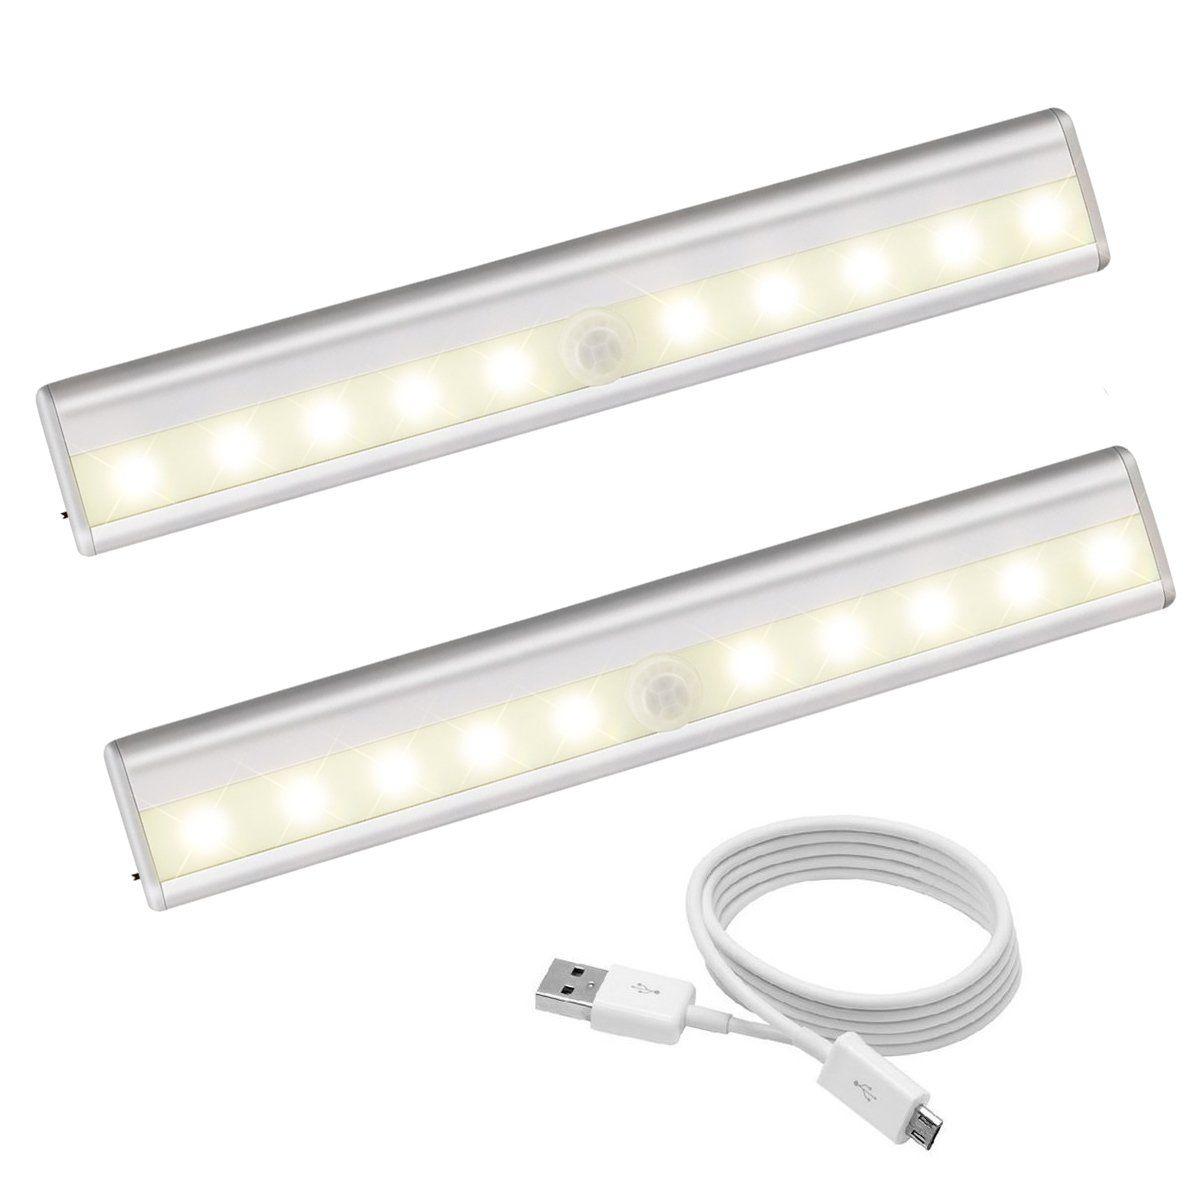 Bon Motion Sensor Closet Lights, 10 LED Rechargeable Under Cabinet Lighting,  Magnetic Strip Stick